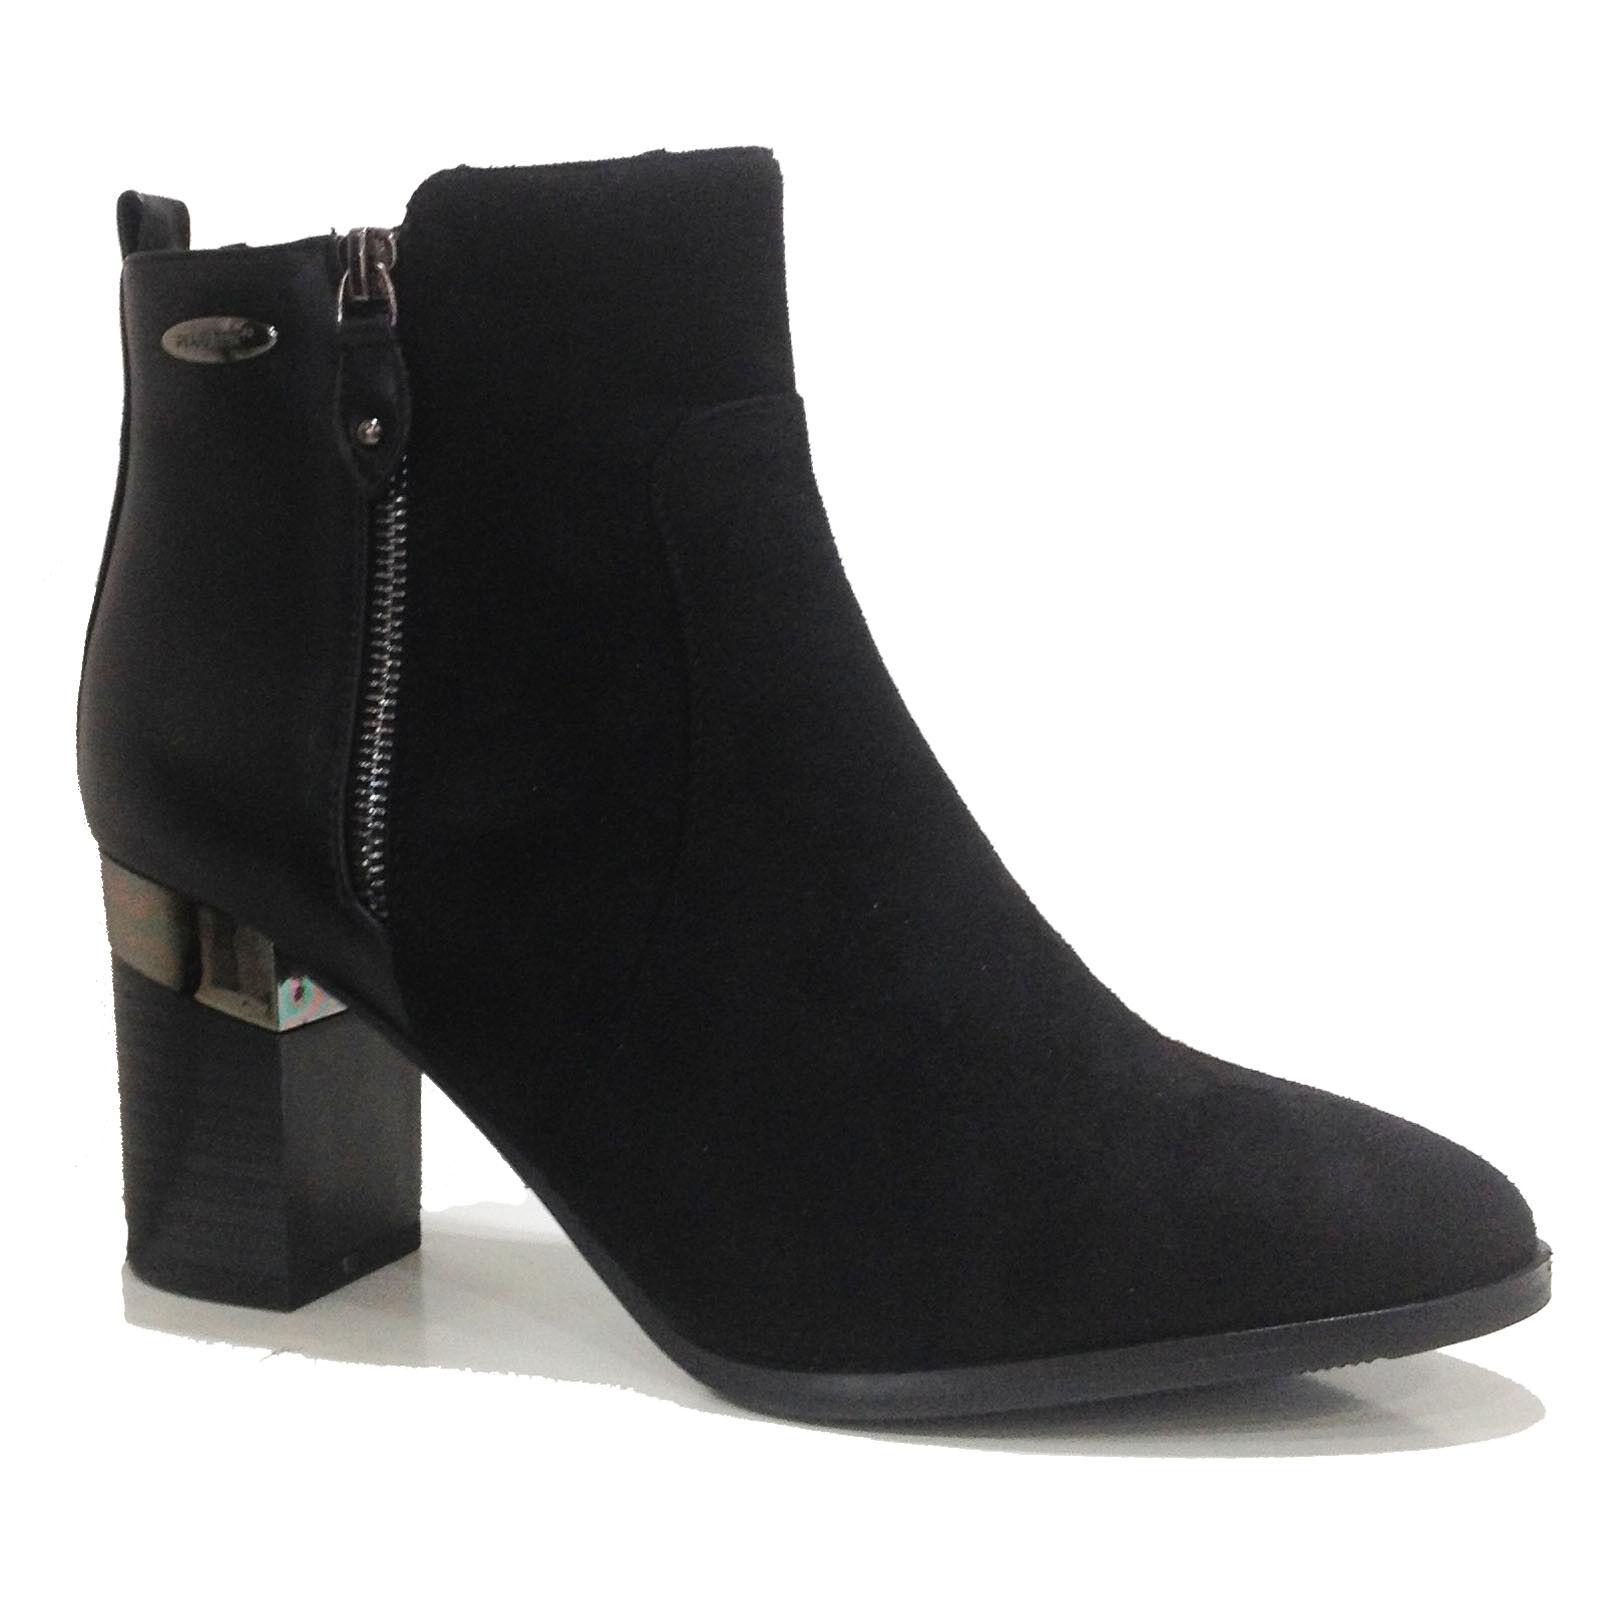 Zapatos especiales con descuento ☼ELEN☼  Bottines à talon - RAXMAX - Ref: 0856